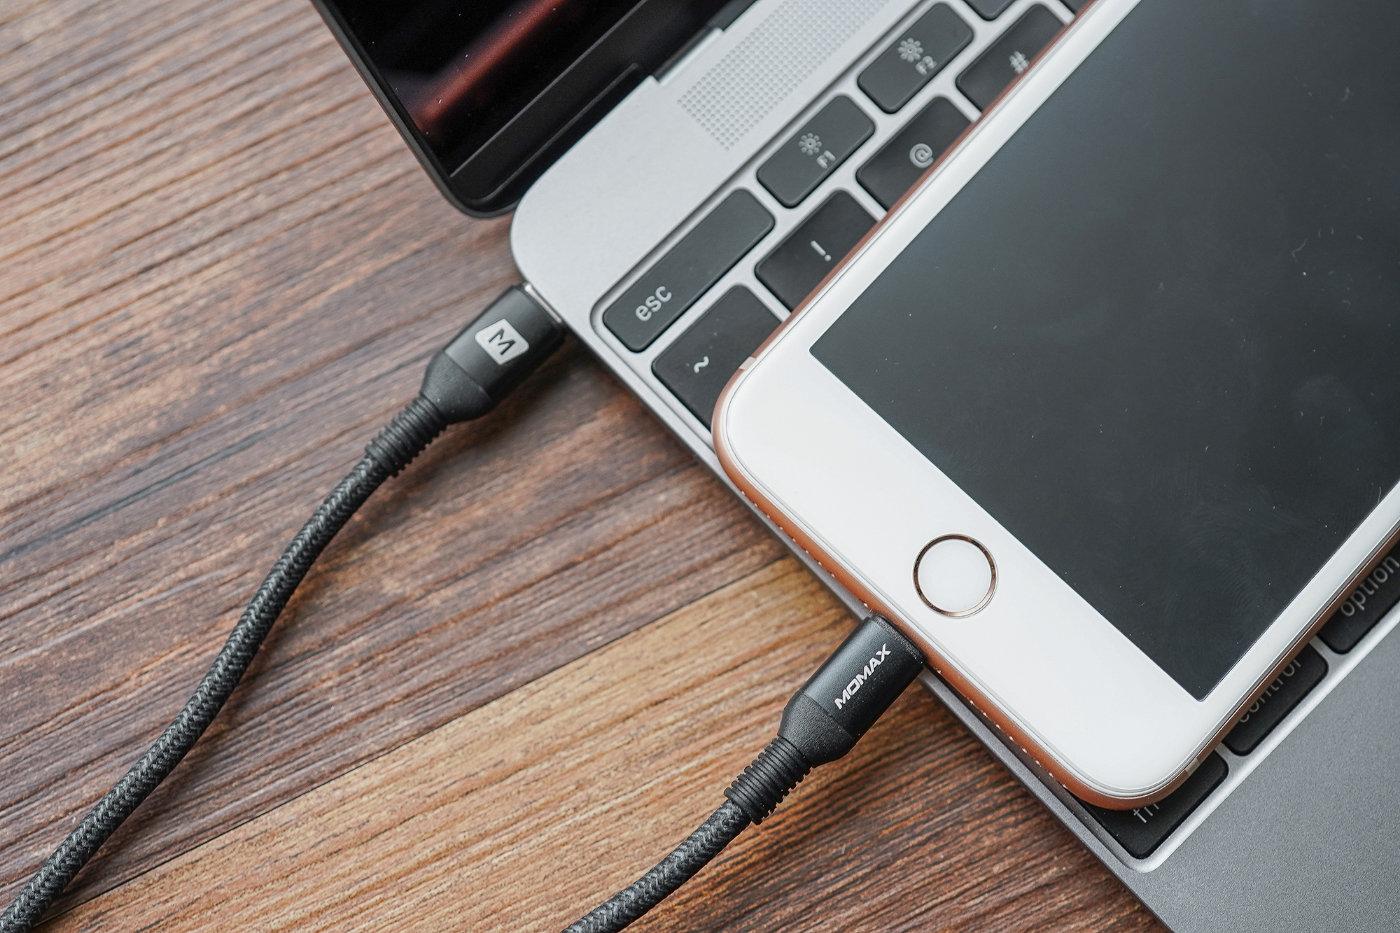 iPhone充电太慢了,试试摩米士PD快充线?